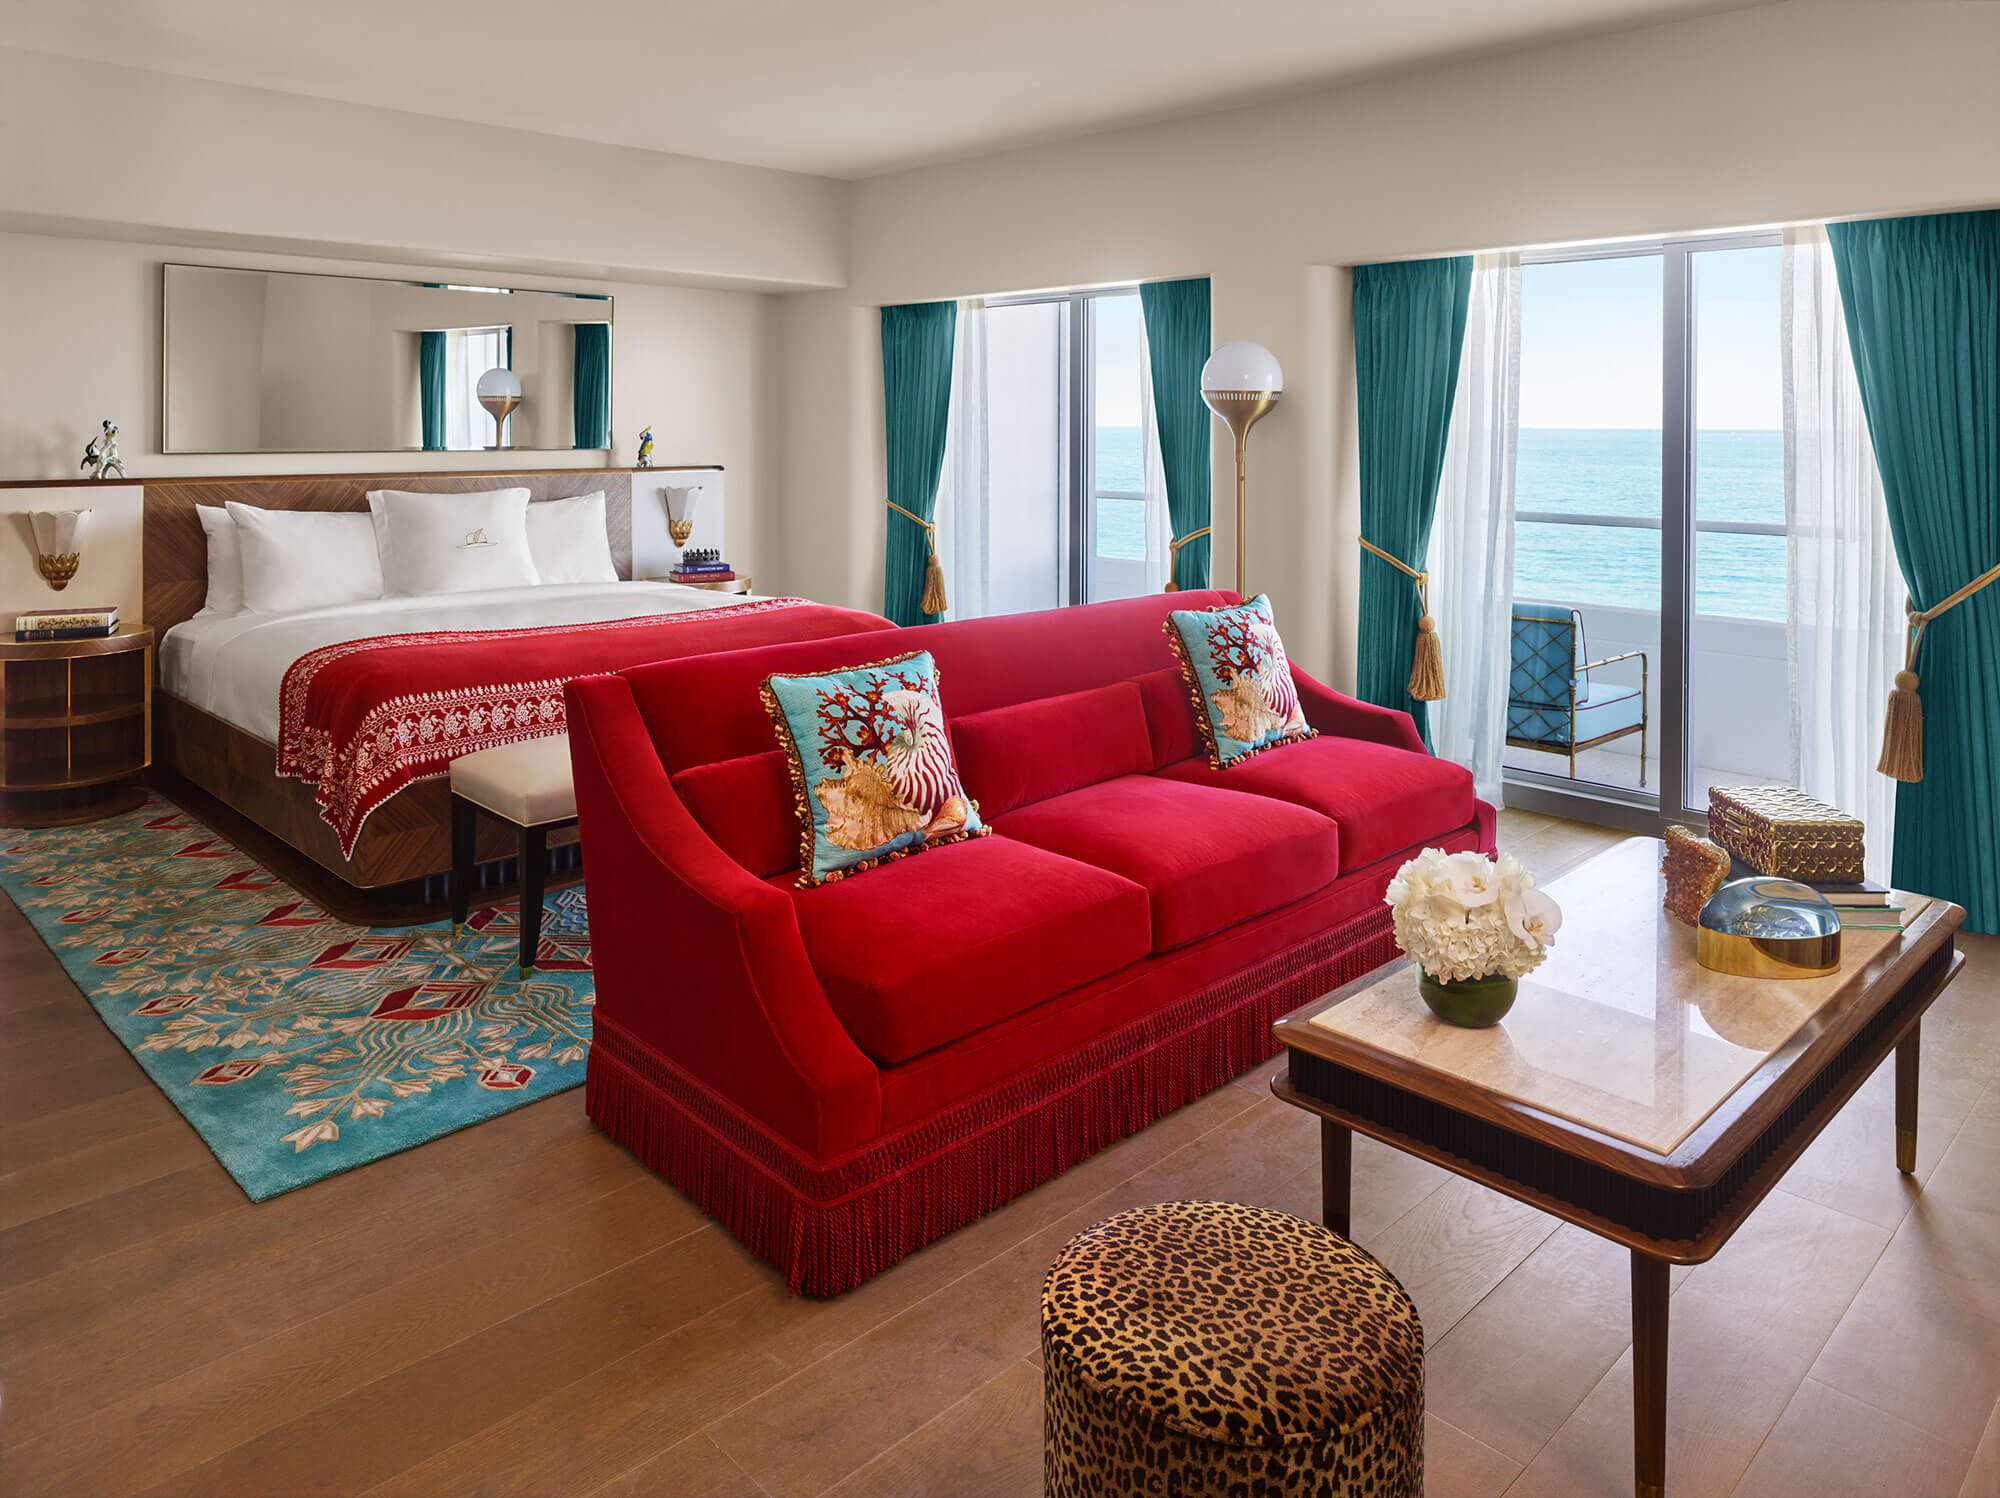 04_Rooms_Faena_hotel_808_RGB_Premier-Ocean-Front-Room.jpg